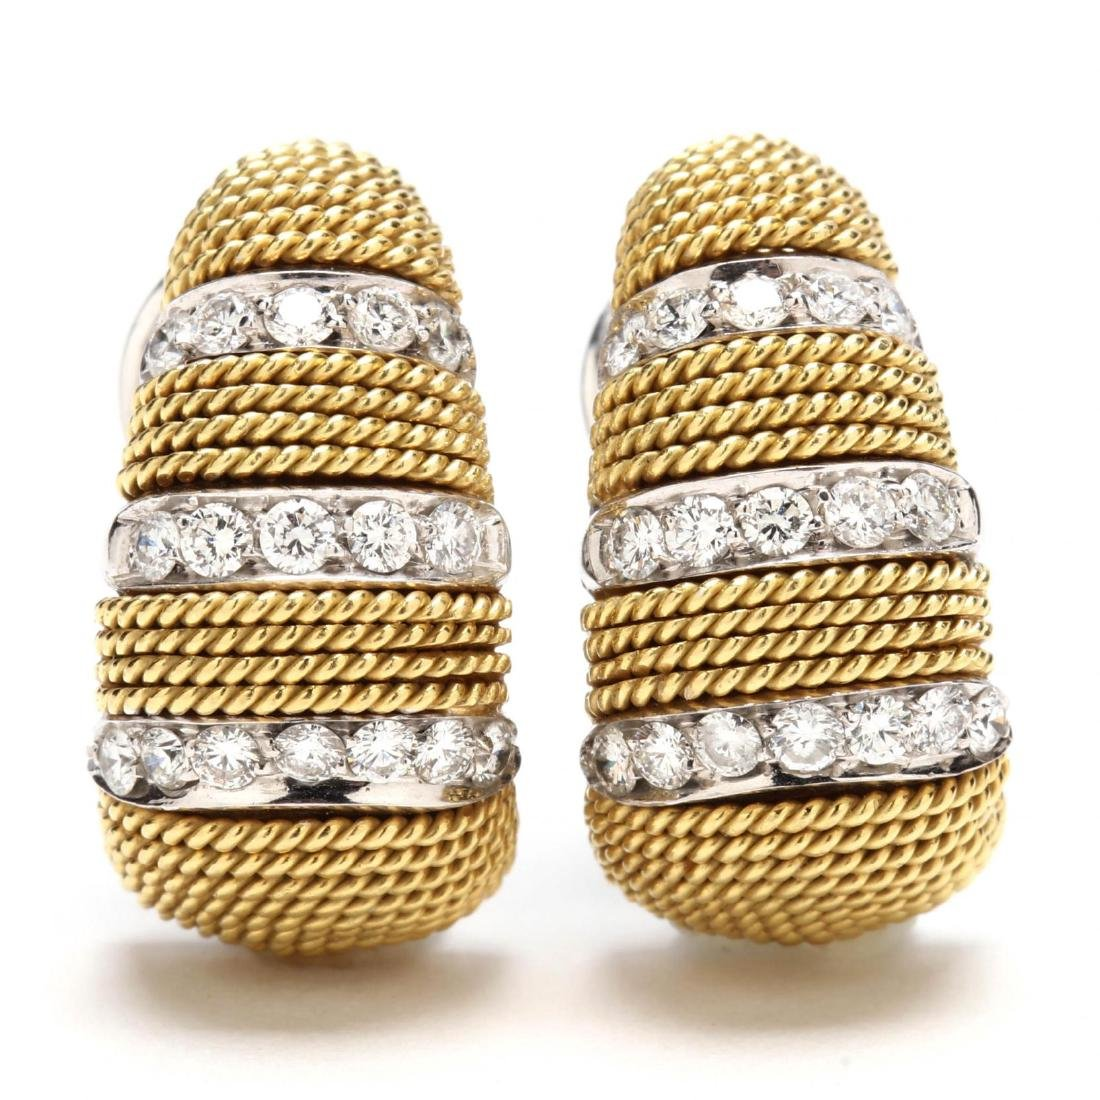 18KT Gold and Diamond Earrings, Harpo's